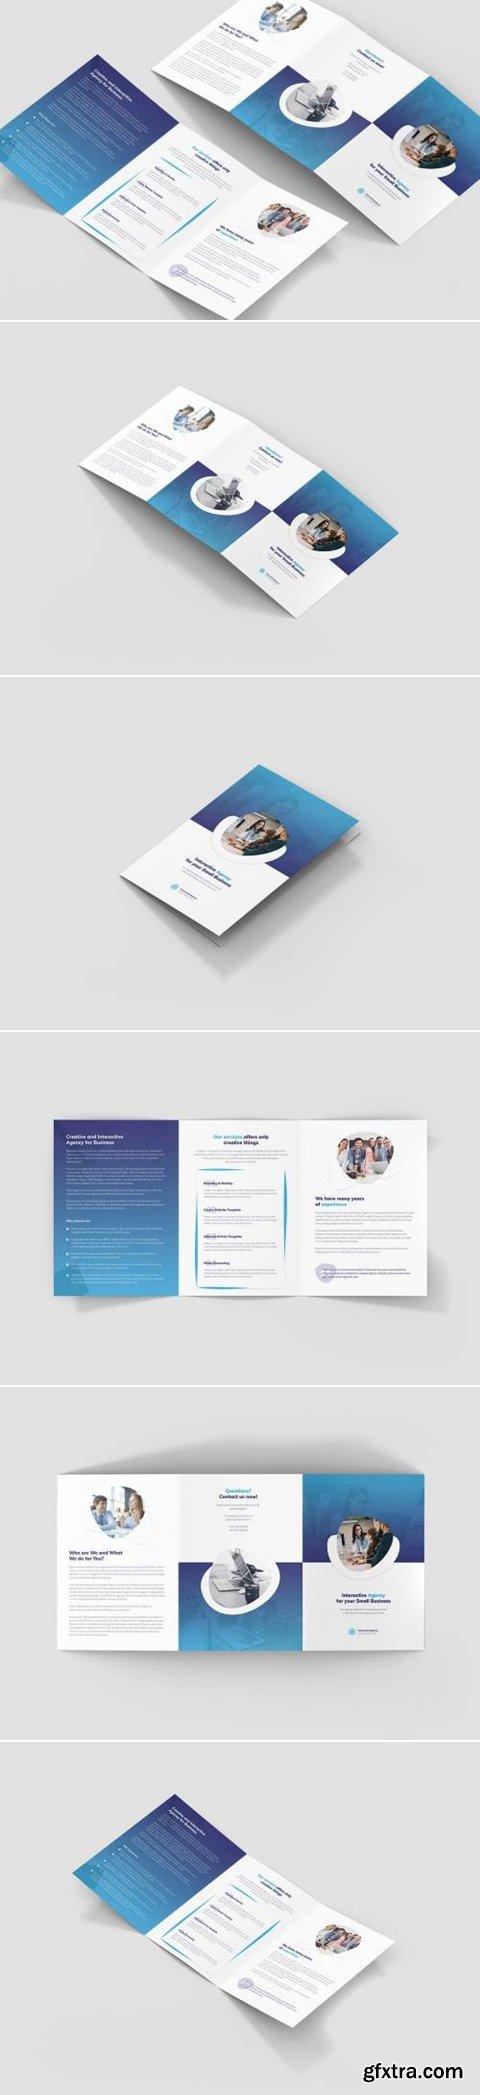 Brochure – Interactive Agency Tri-Fold A5